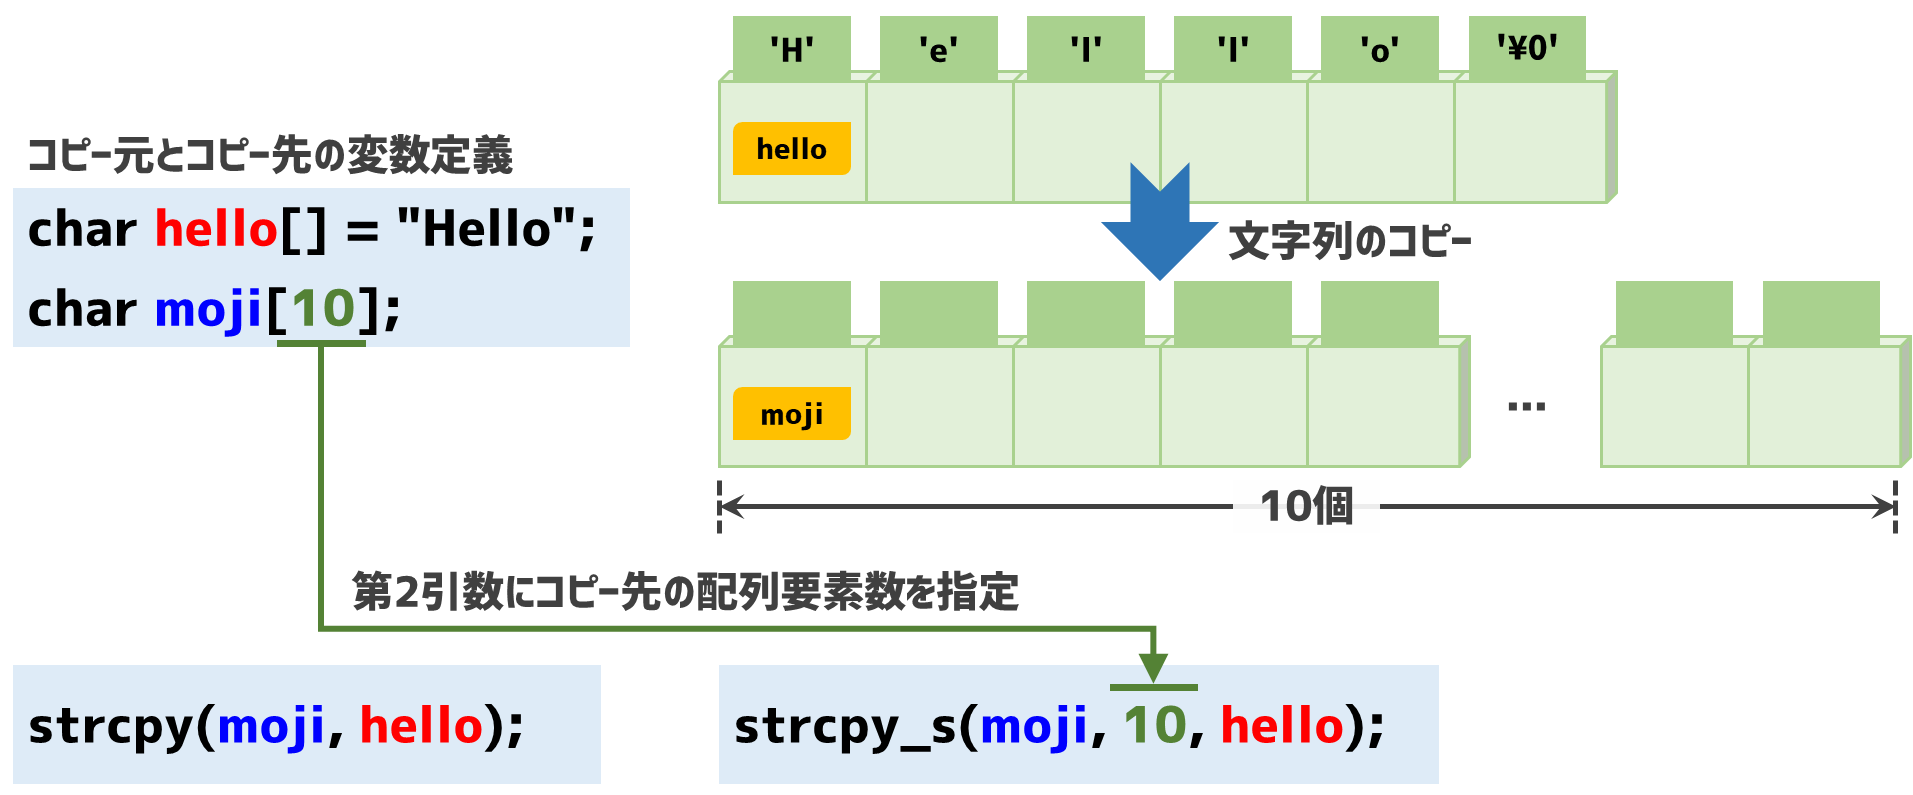 strcpy_s関数への移行方法